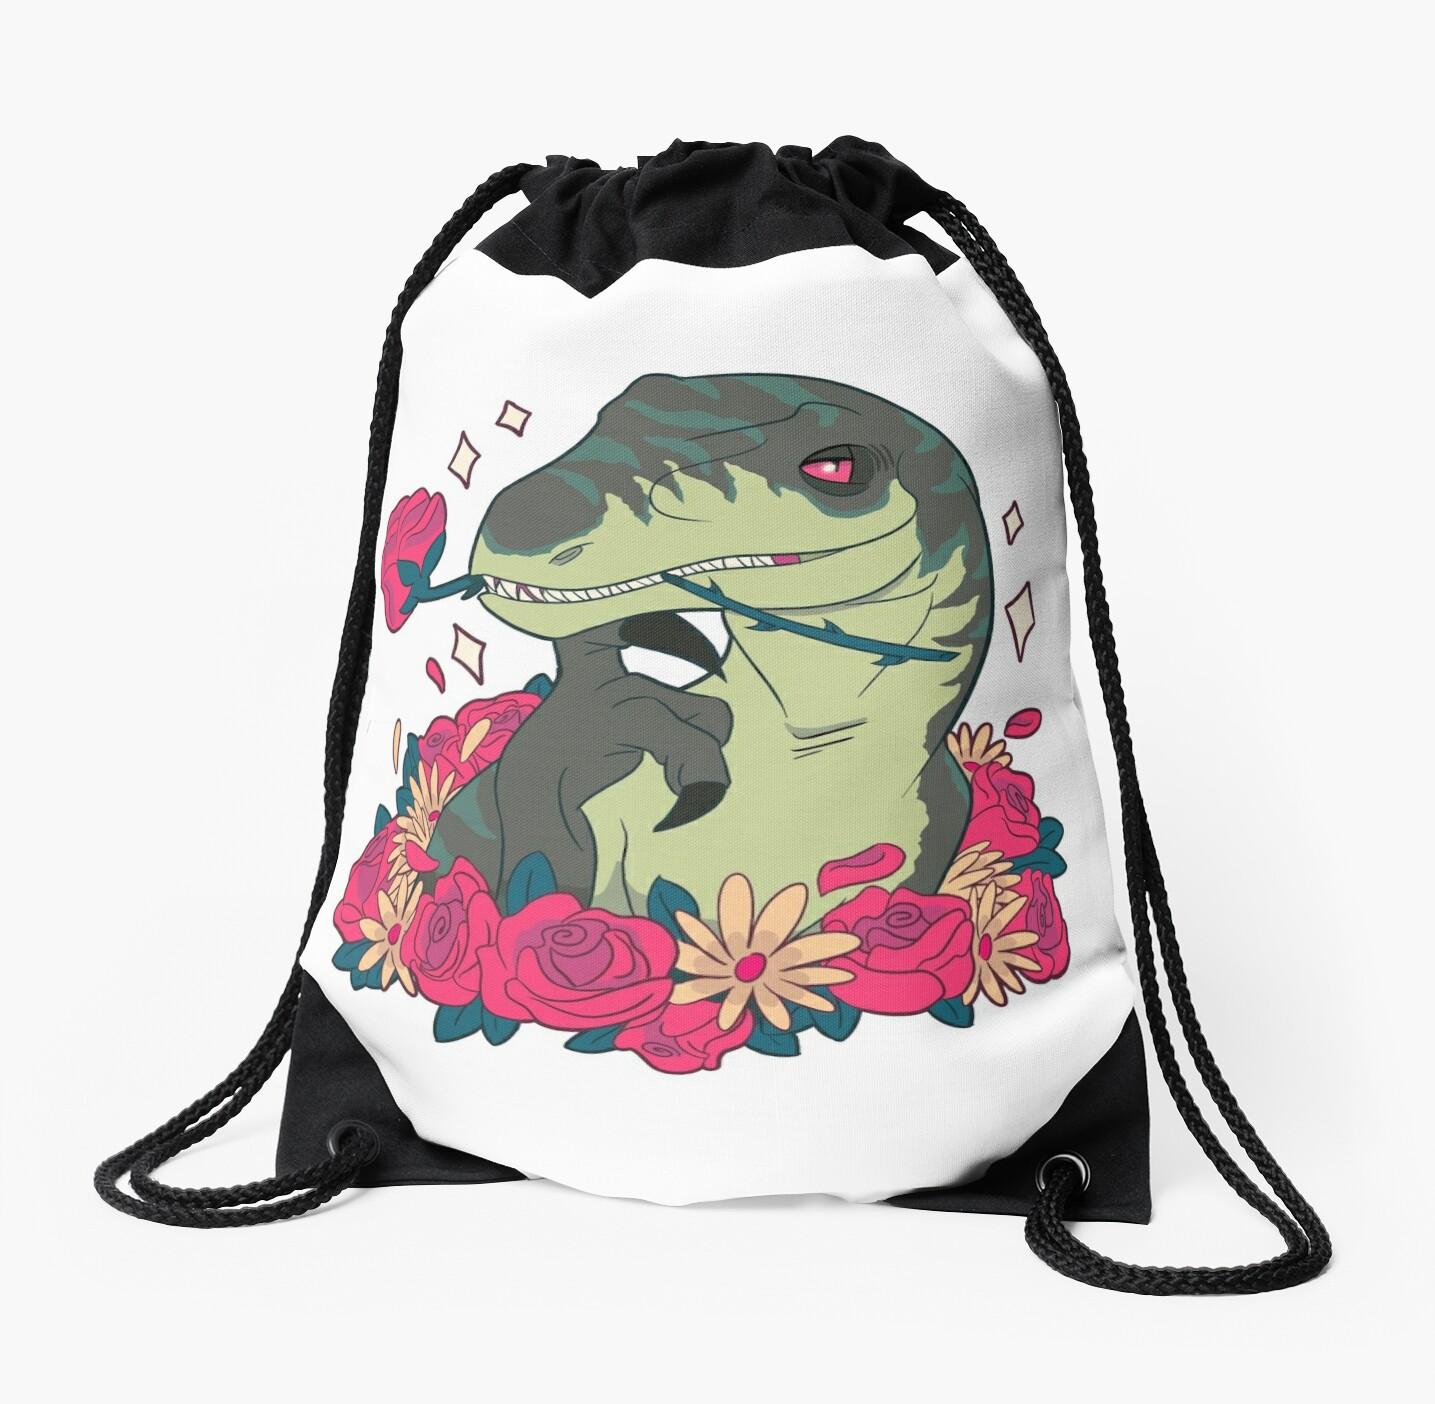 Ravishing Raptor by Daisy Spiers